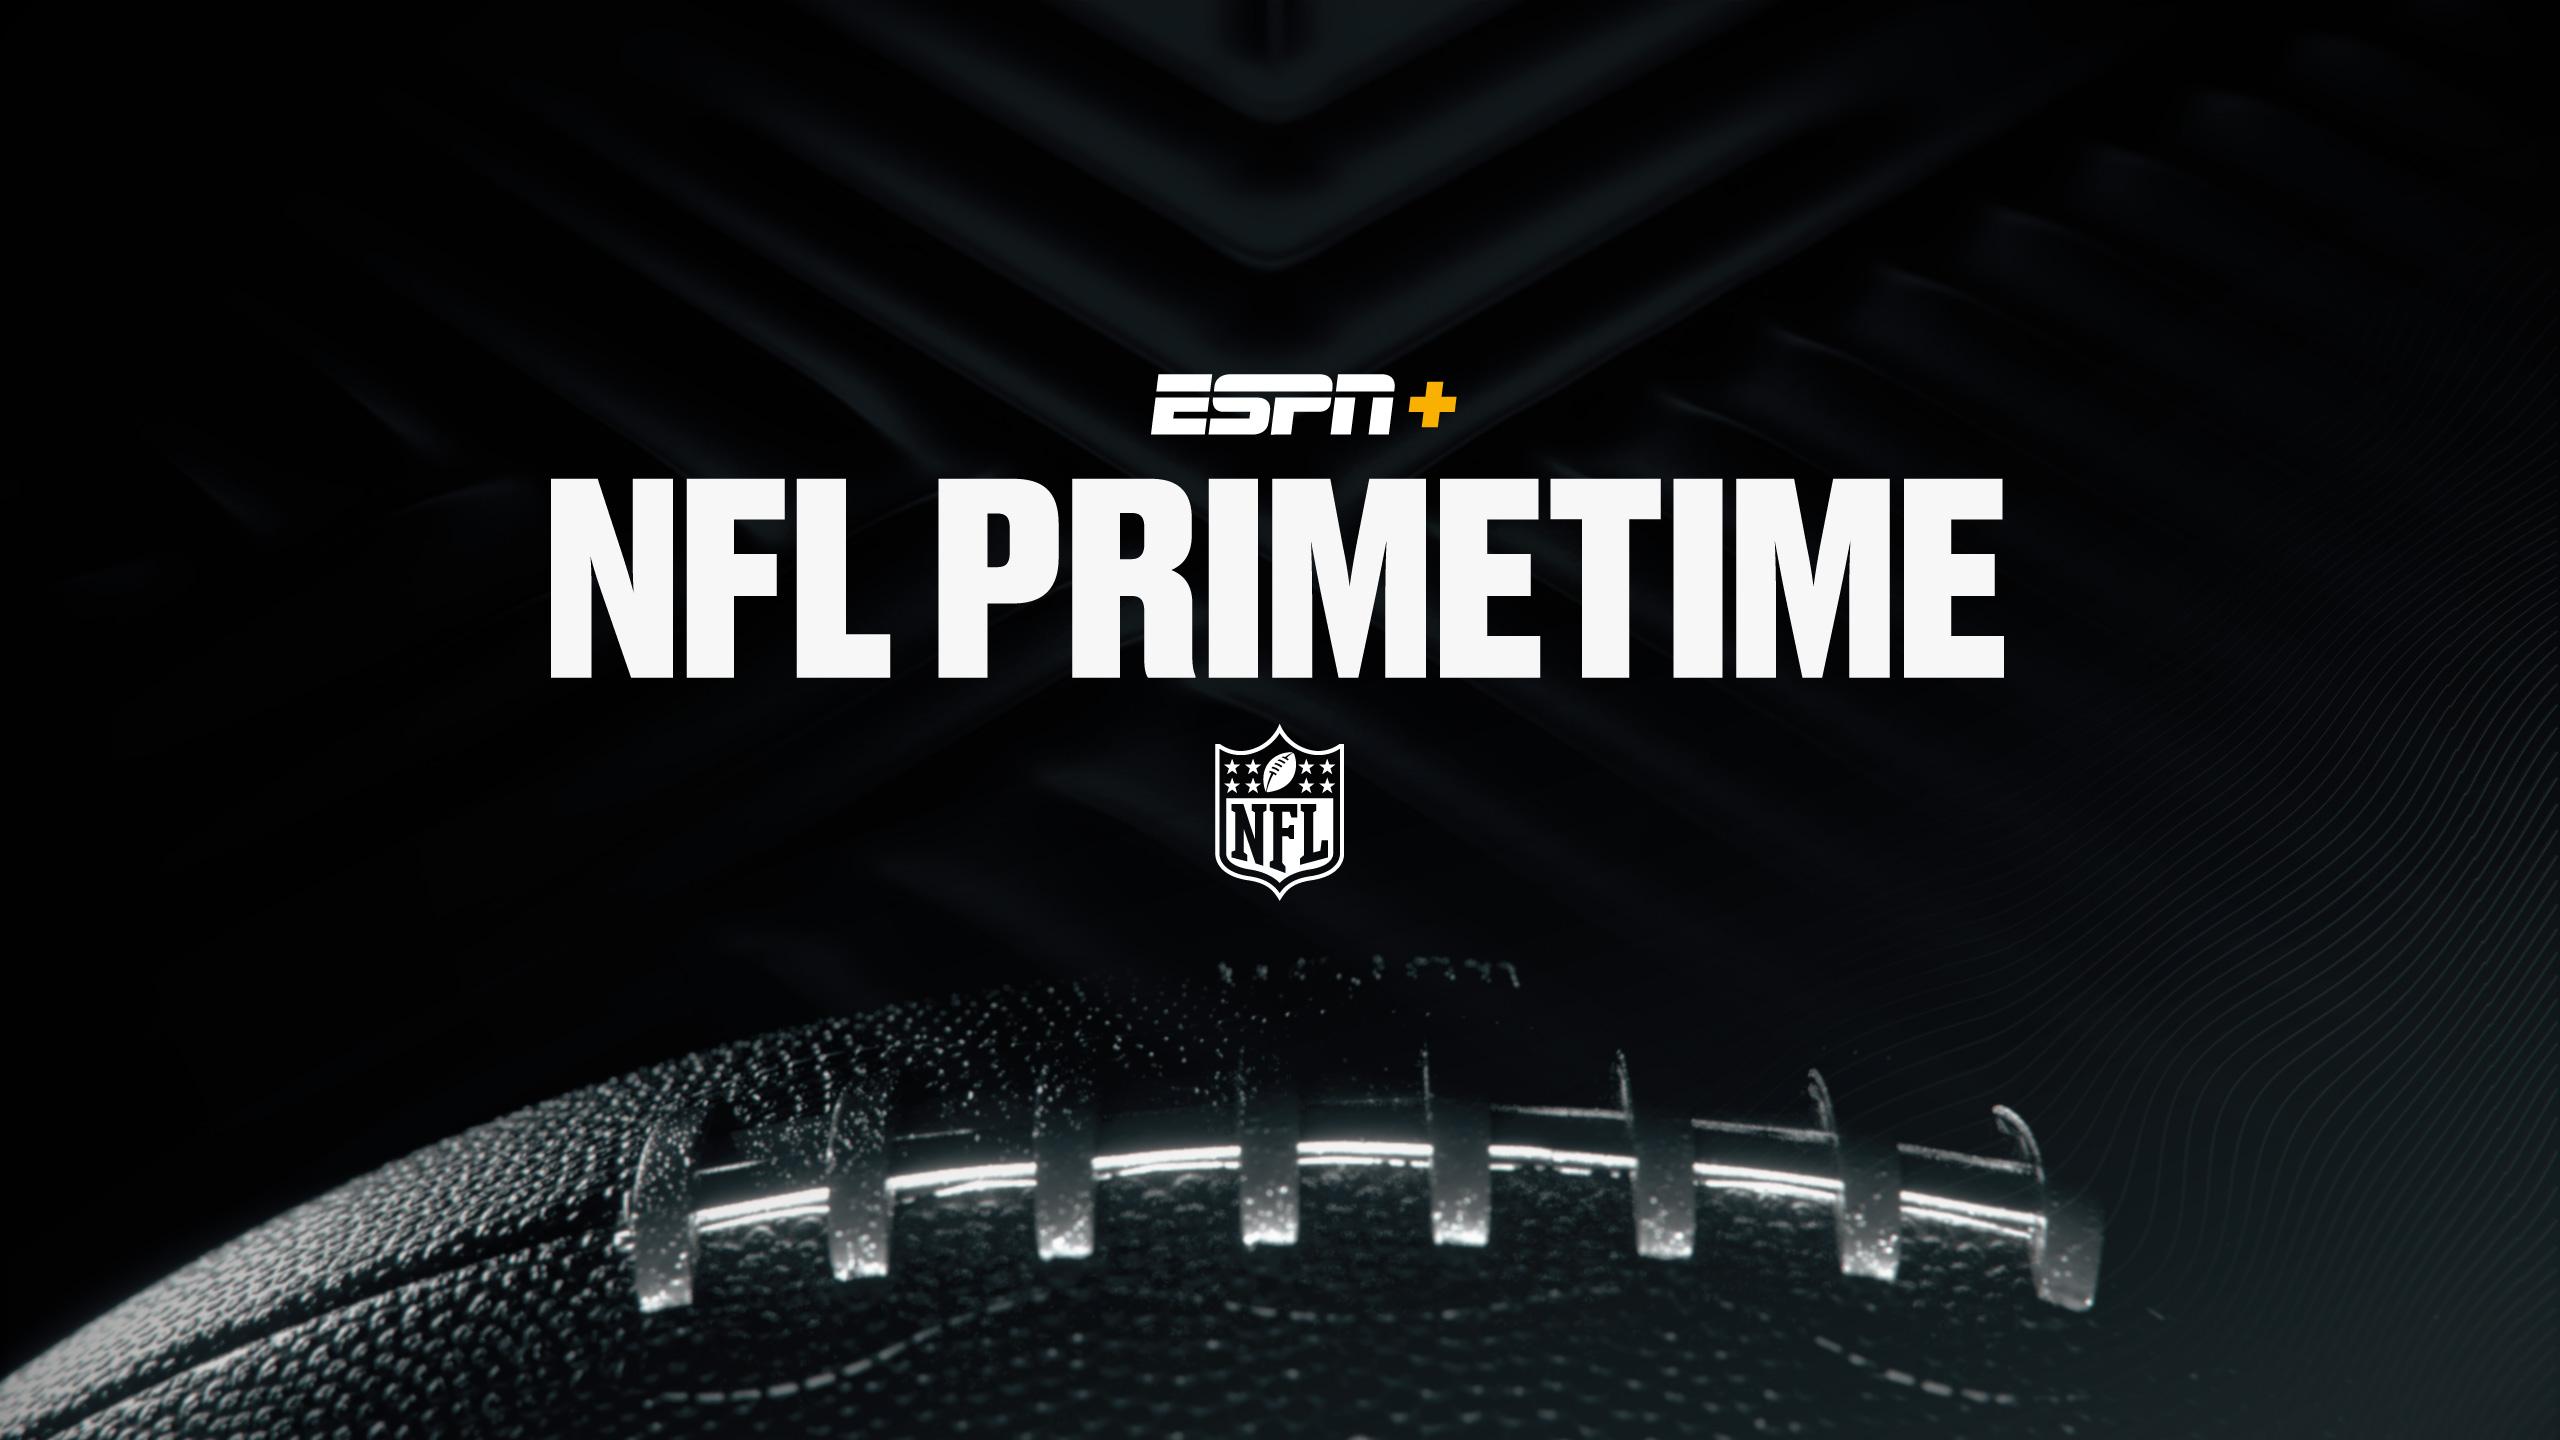 NFL_PrimetimePlus_2560x1440.jpg